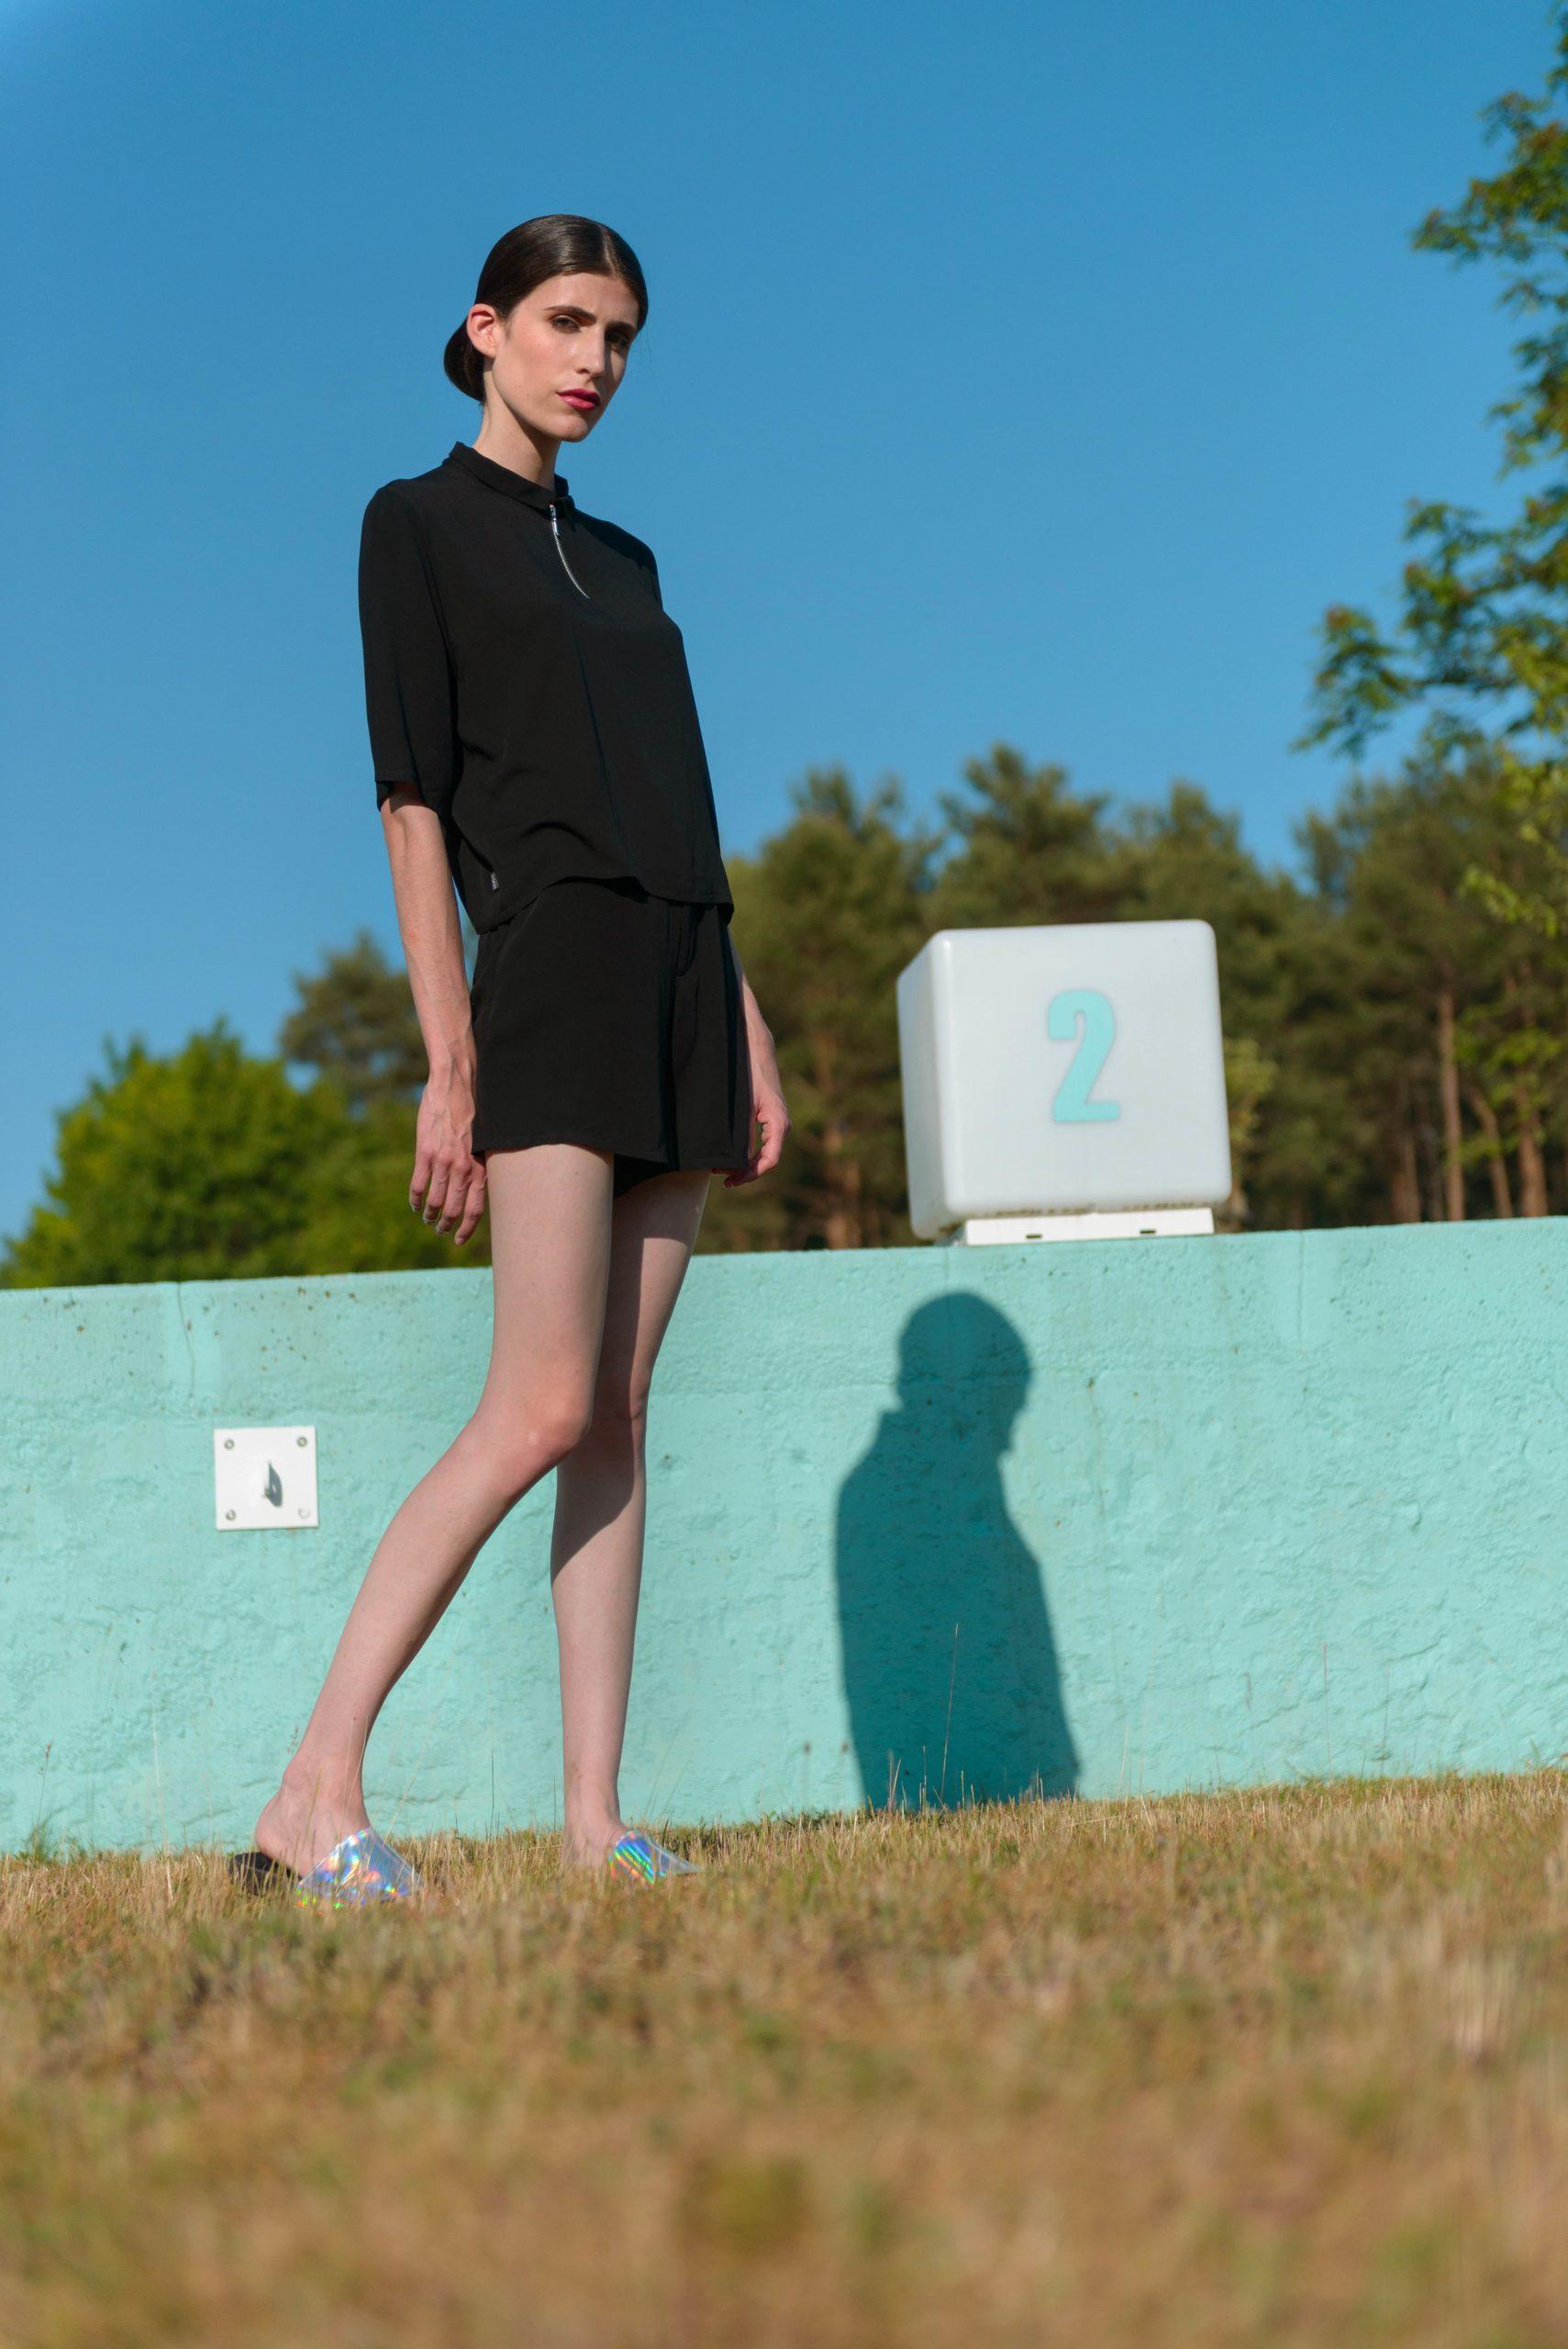 fashion: the spot   photography: daniel scholz  hair/ make up: uta stabler